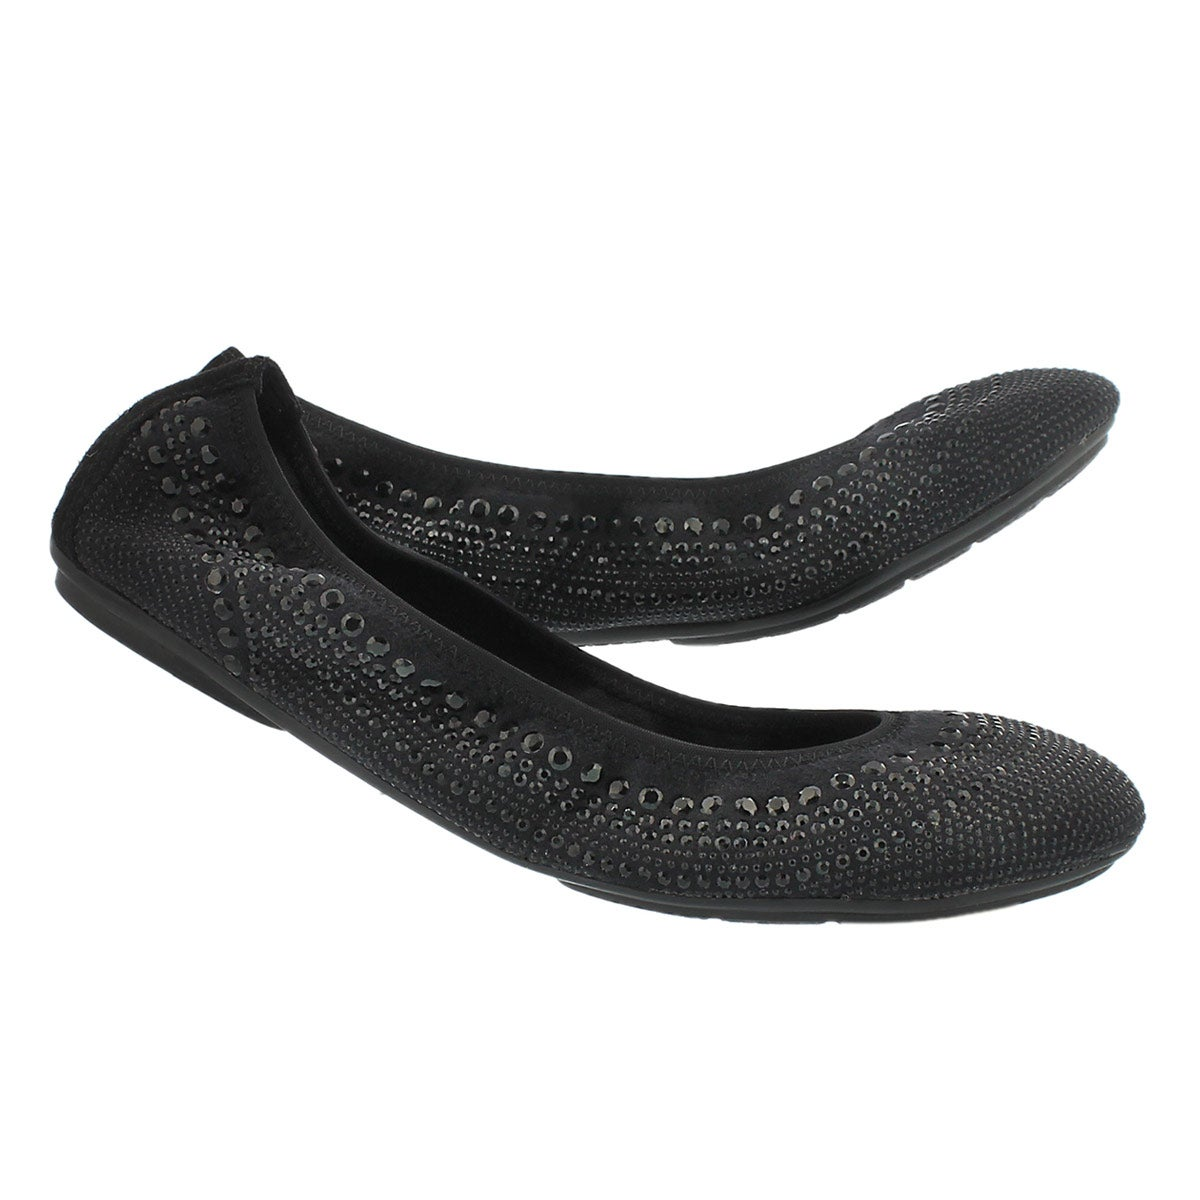 Lds Chaste Ballet black studded flat